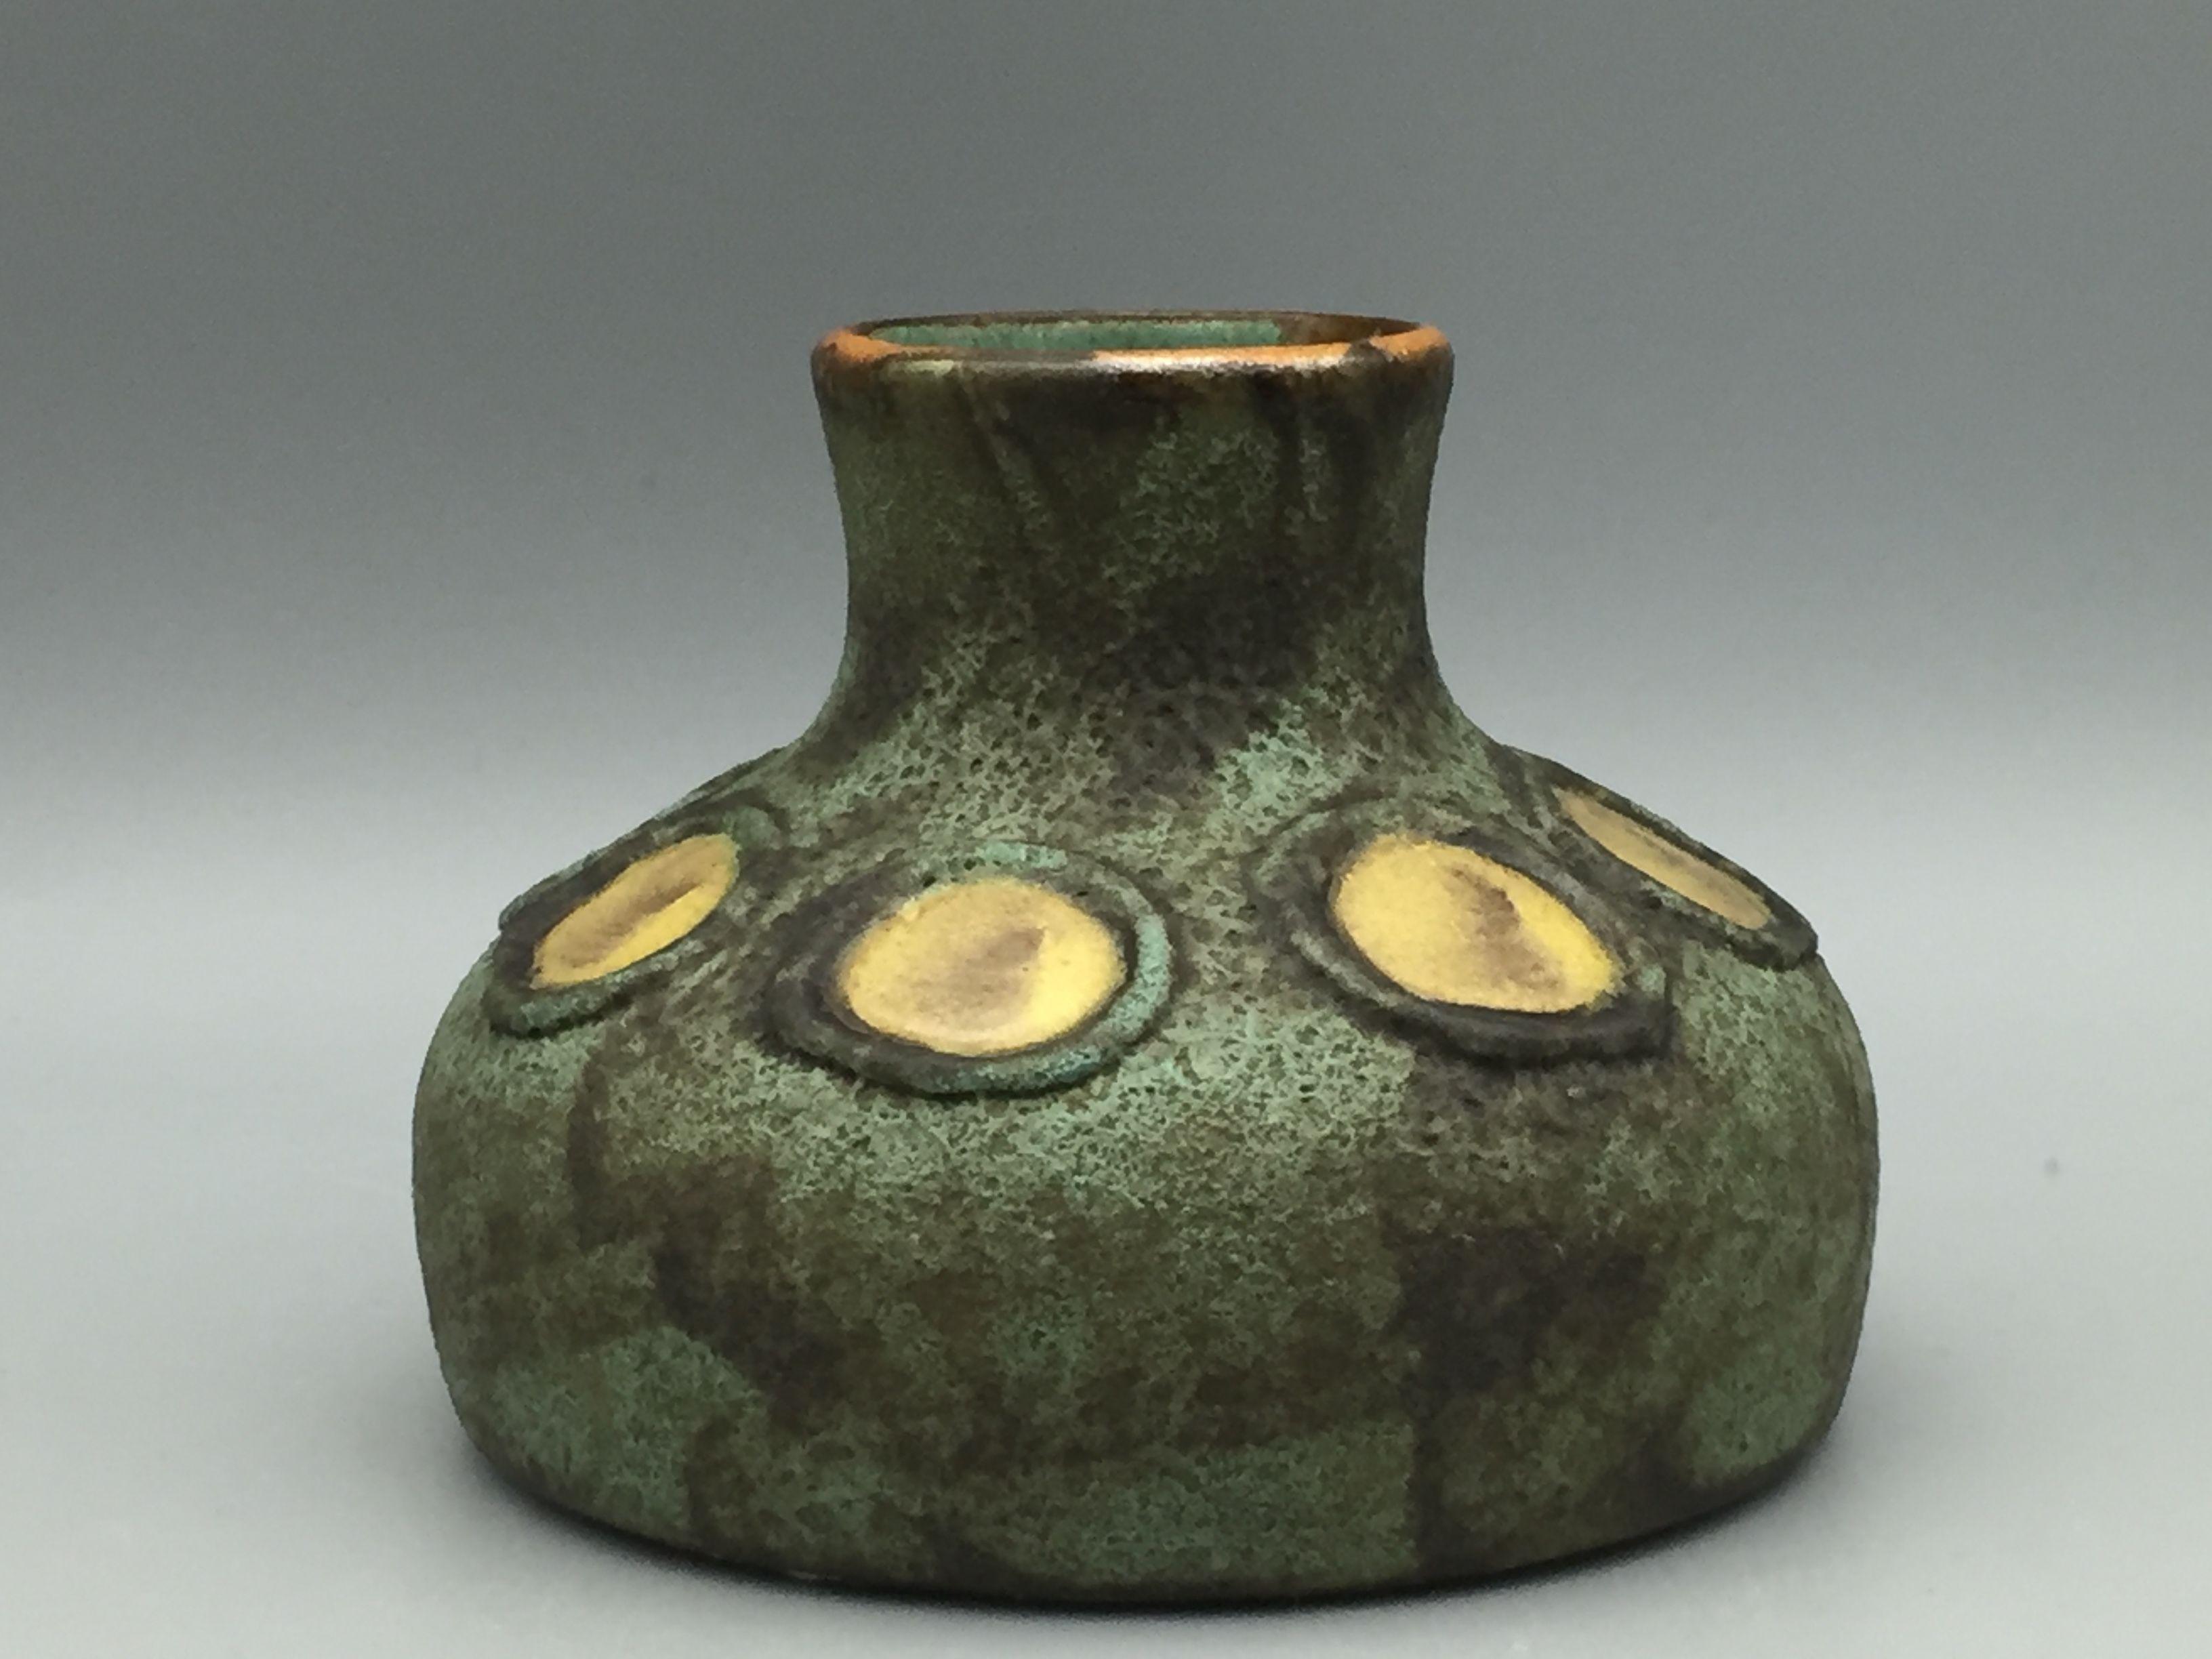 Ceramano 164 Toscana. WGP Ceramic. Aksesuarlar